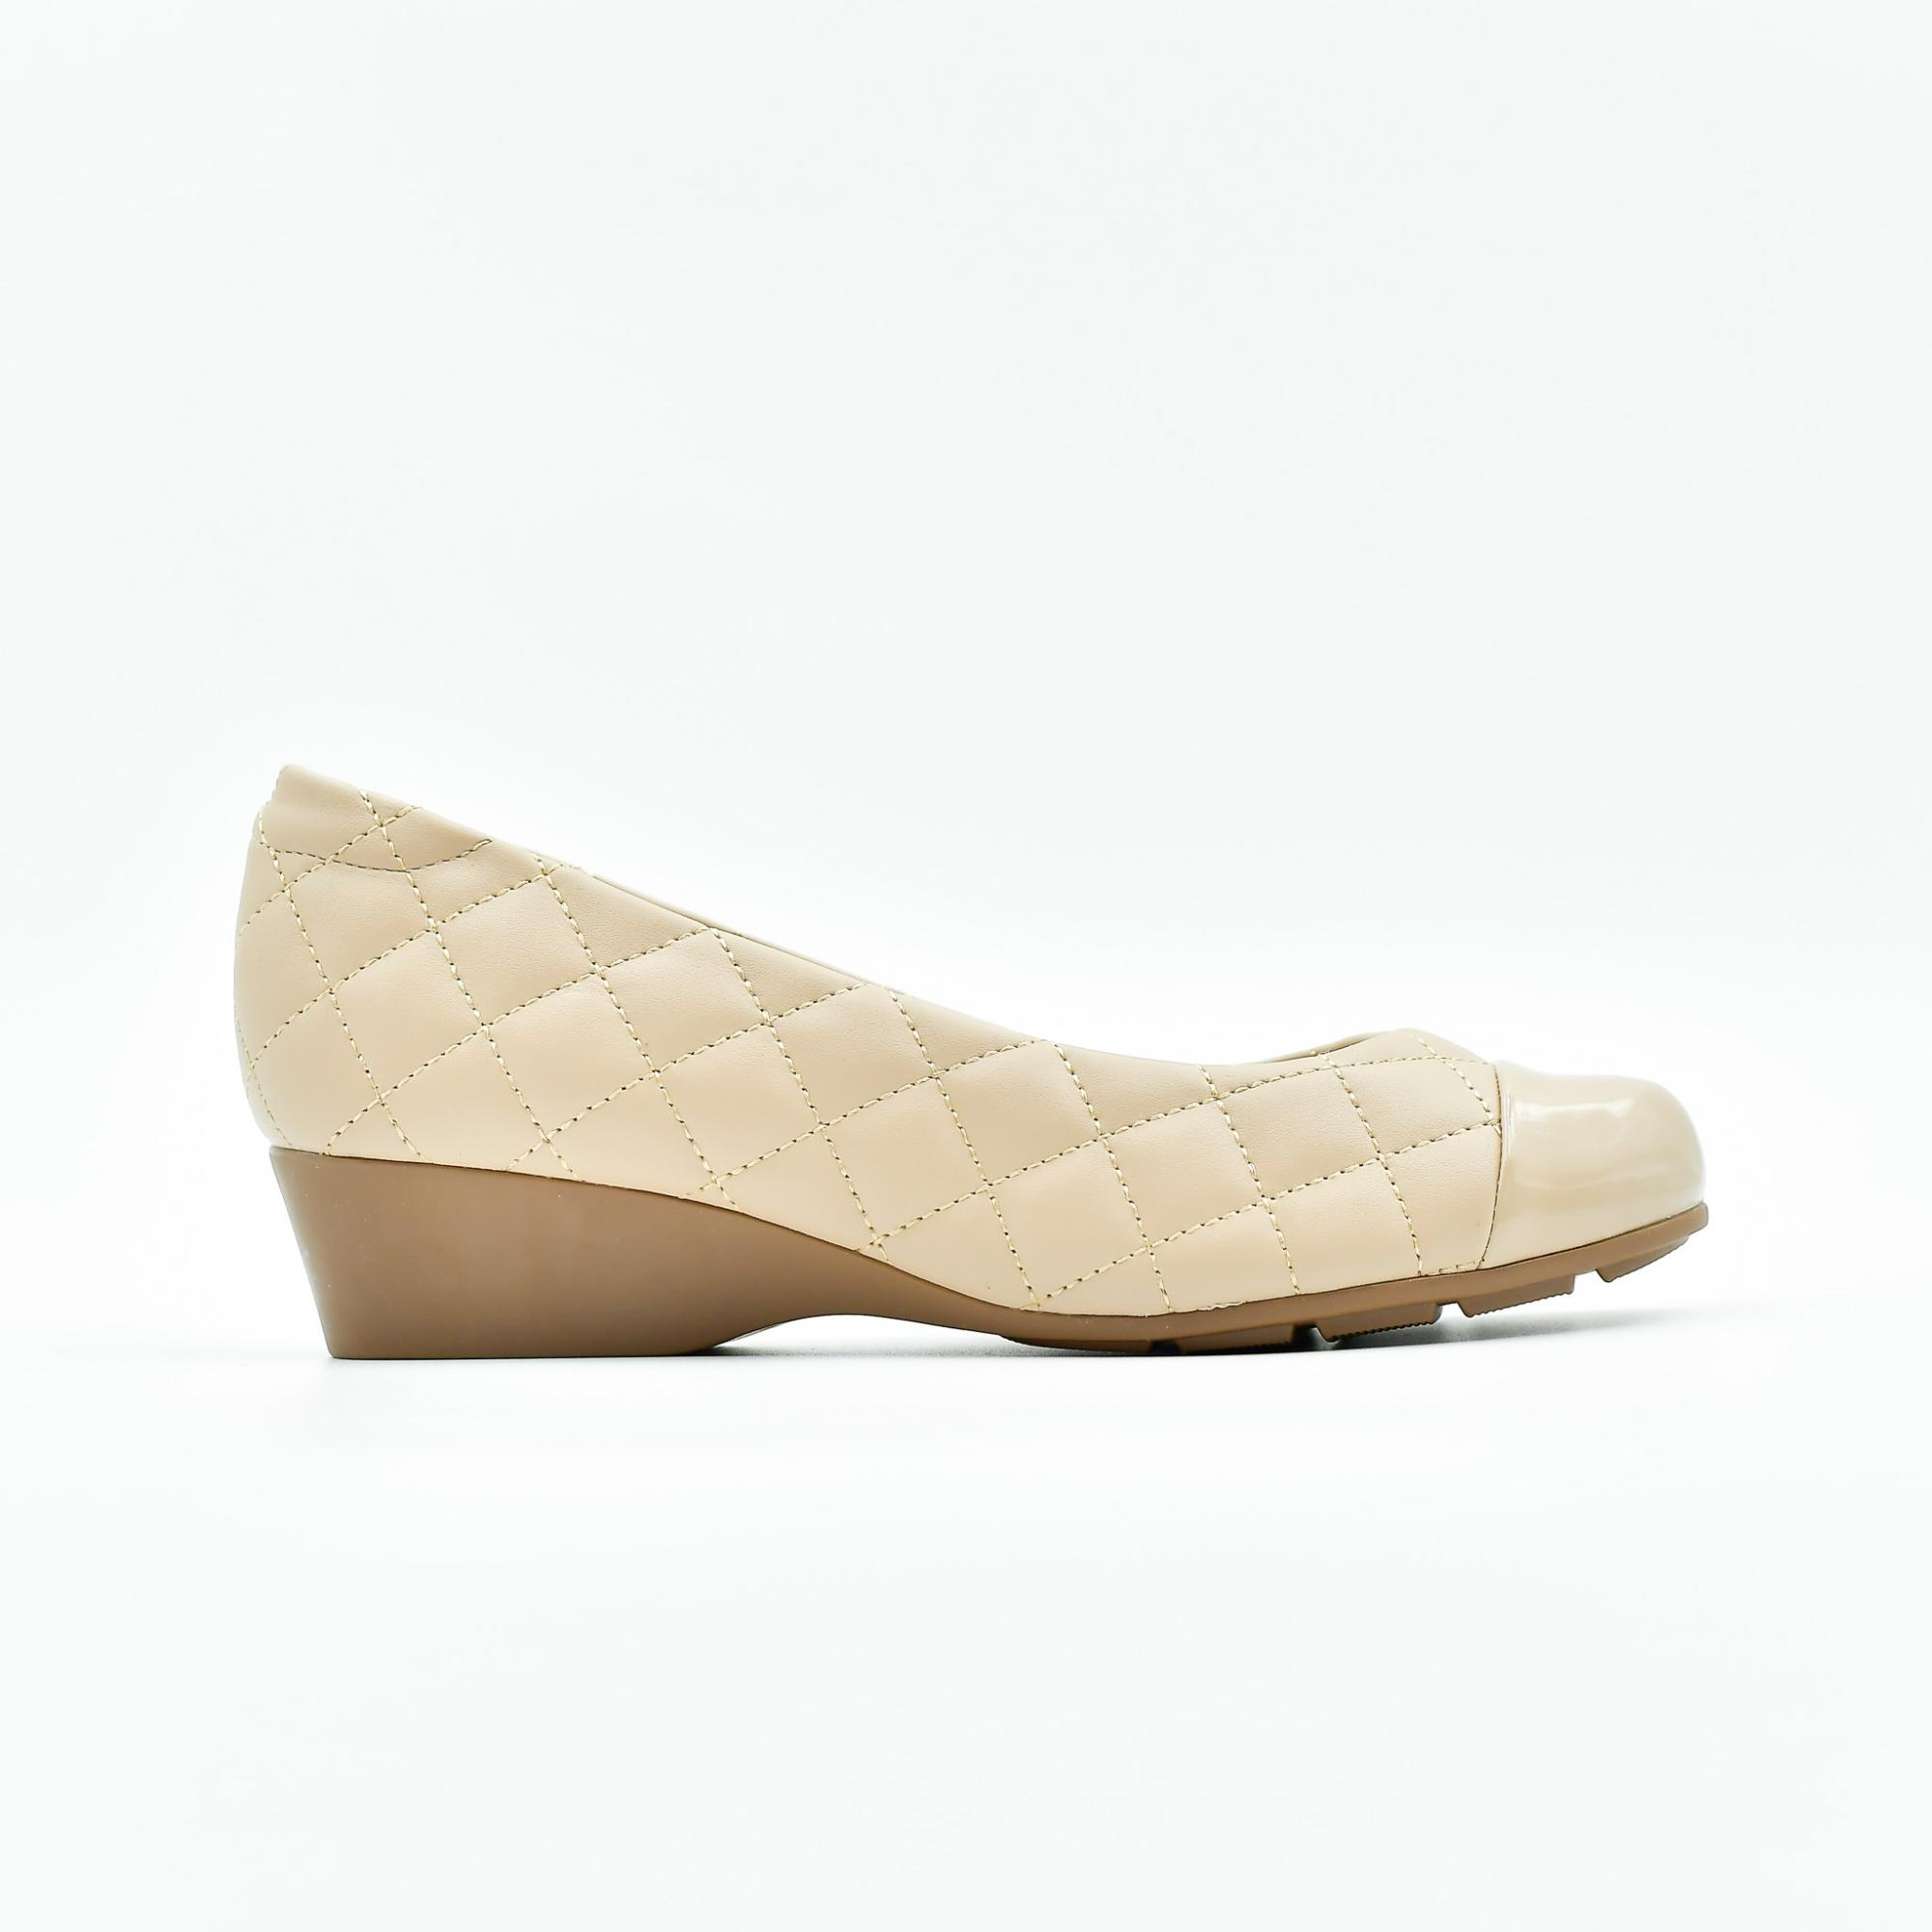 Sapato Feminino Anabela Modare Napa Pele Verniz Bege